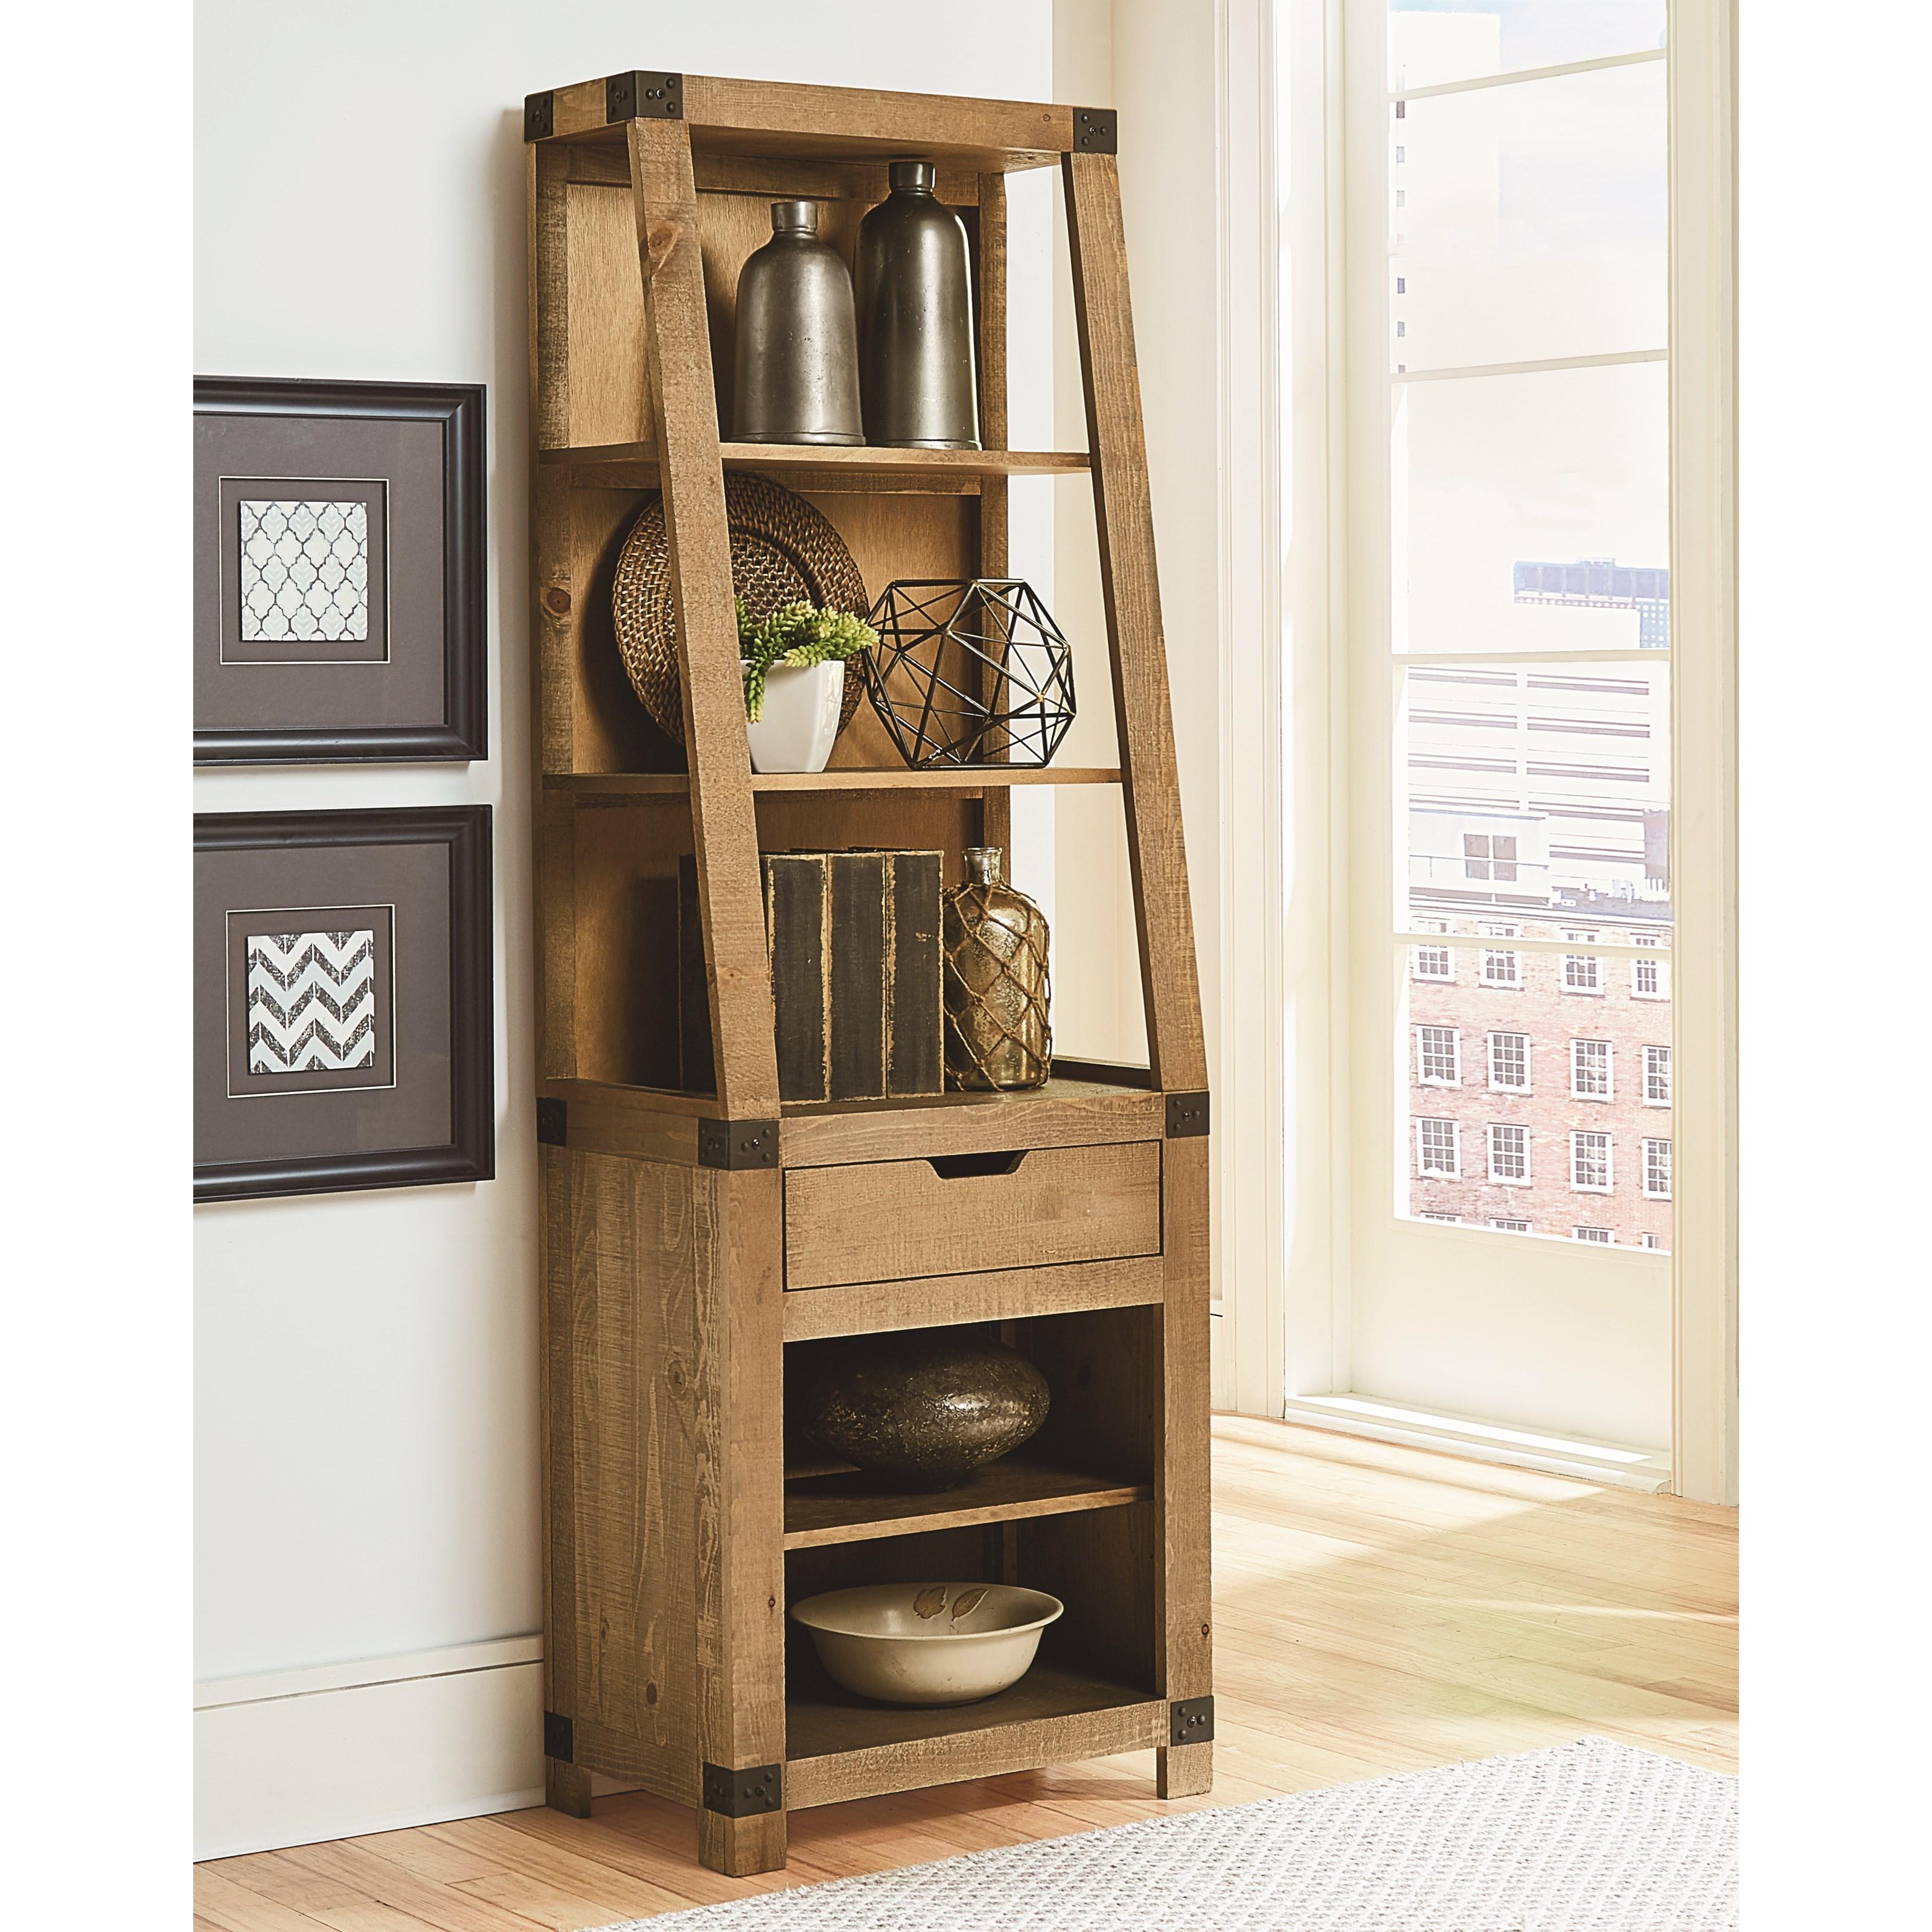 Mojo Pier Unit by Progressive Furniture at Van Hill Furniture